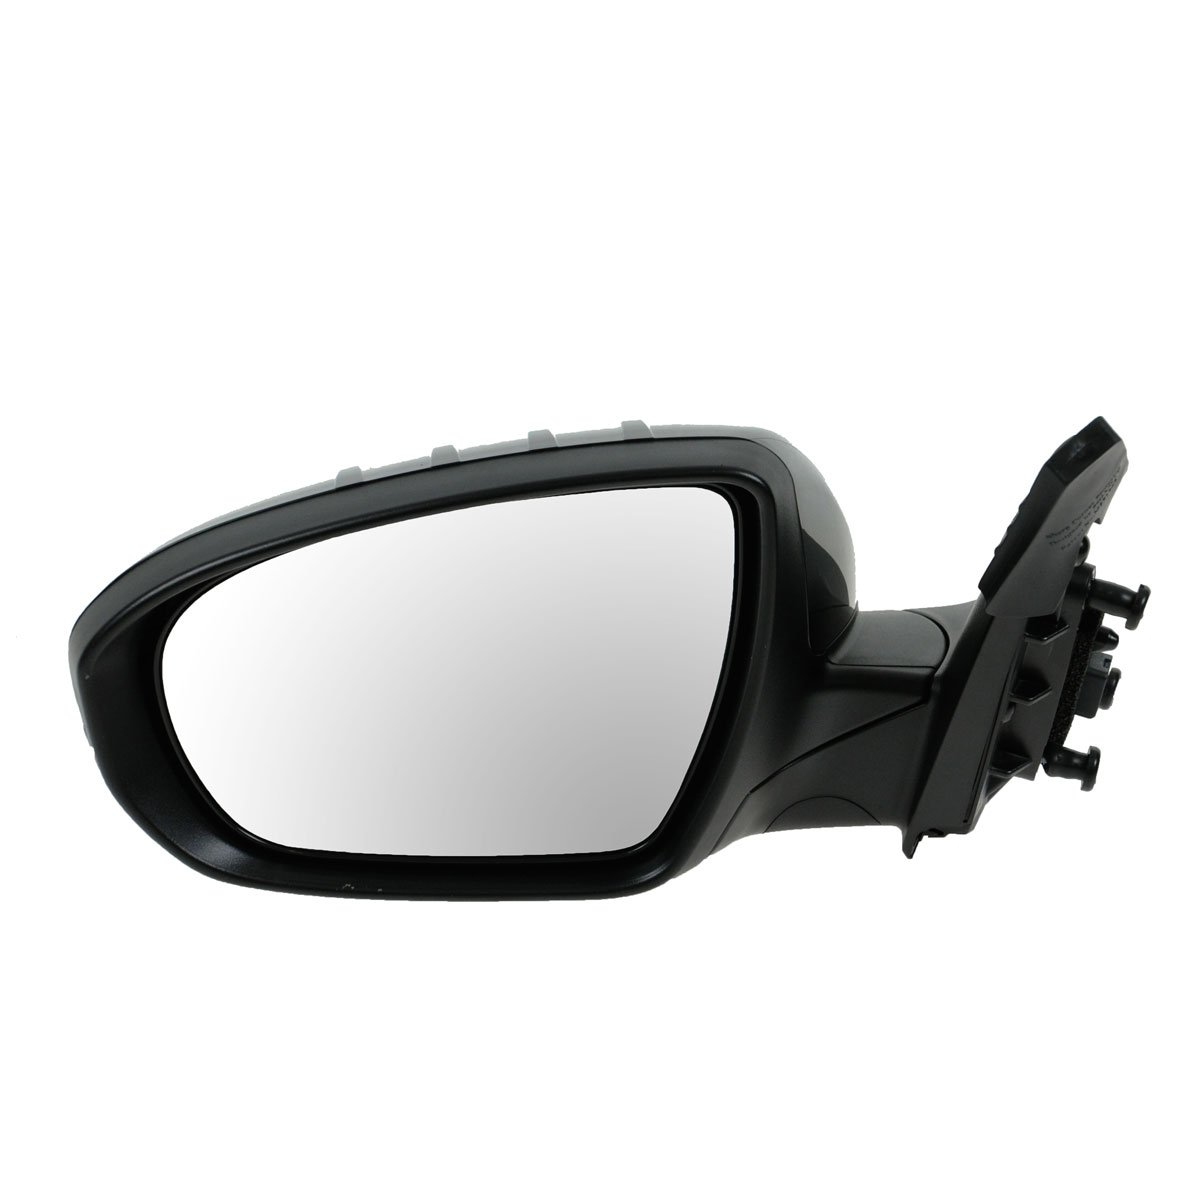 Side View Mirror Power Turn Signal Driver Left LH for 11-13 Kia Optima /& Hybrid